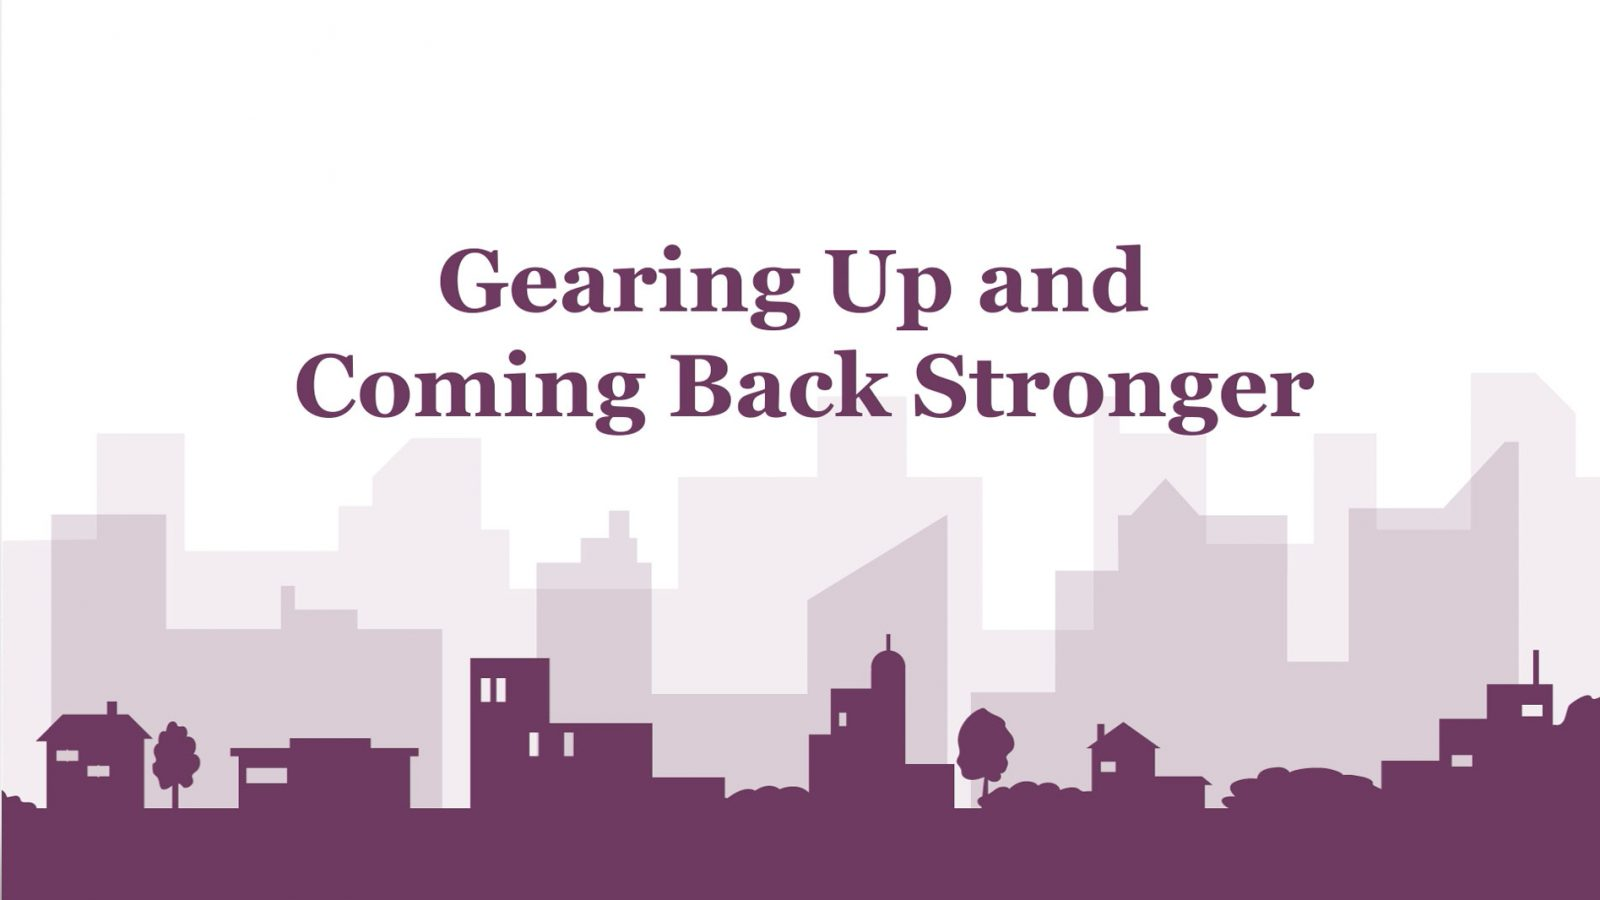 soldbyunited-berkshire-hathaway-united-properties-brokerage-agents-forever-clients-gearing-up-post